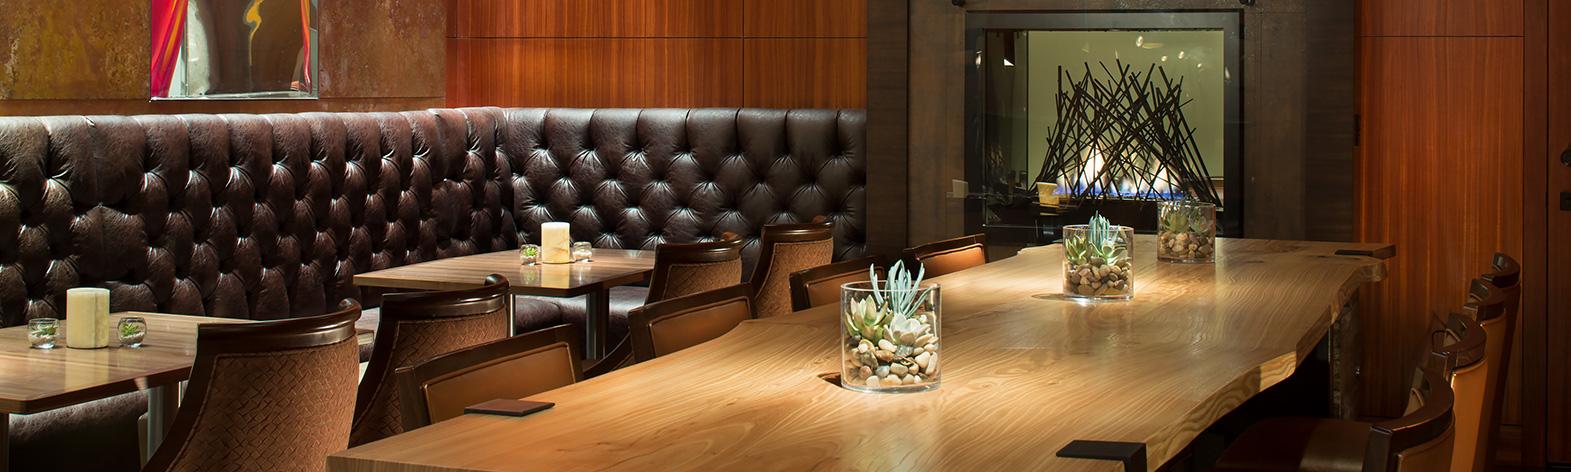 Elway's Ritz-Carlton